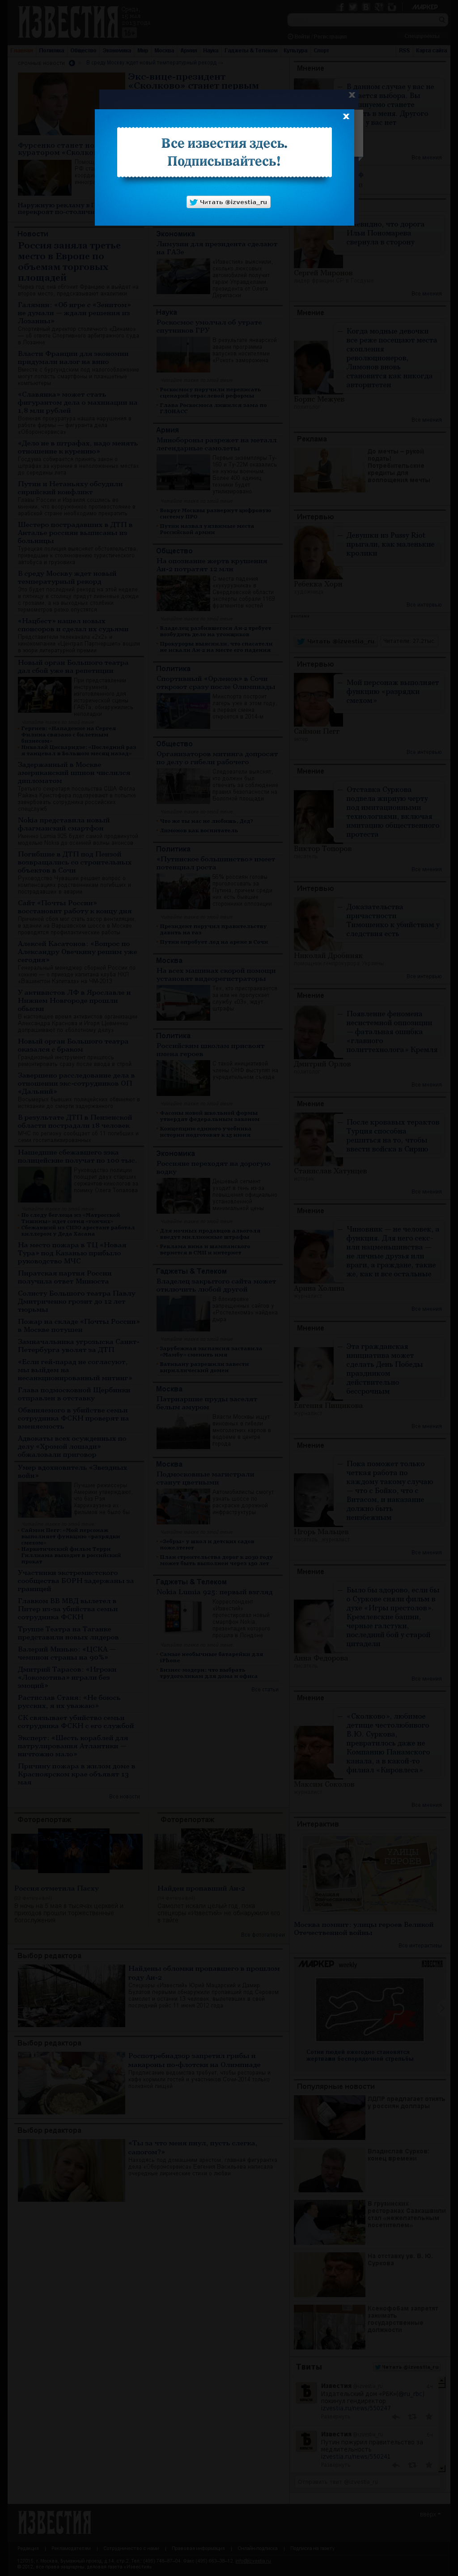 Izvestia at Tuesday May 14, 2013, 9:09 p.m. UTC